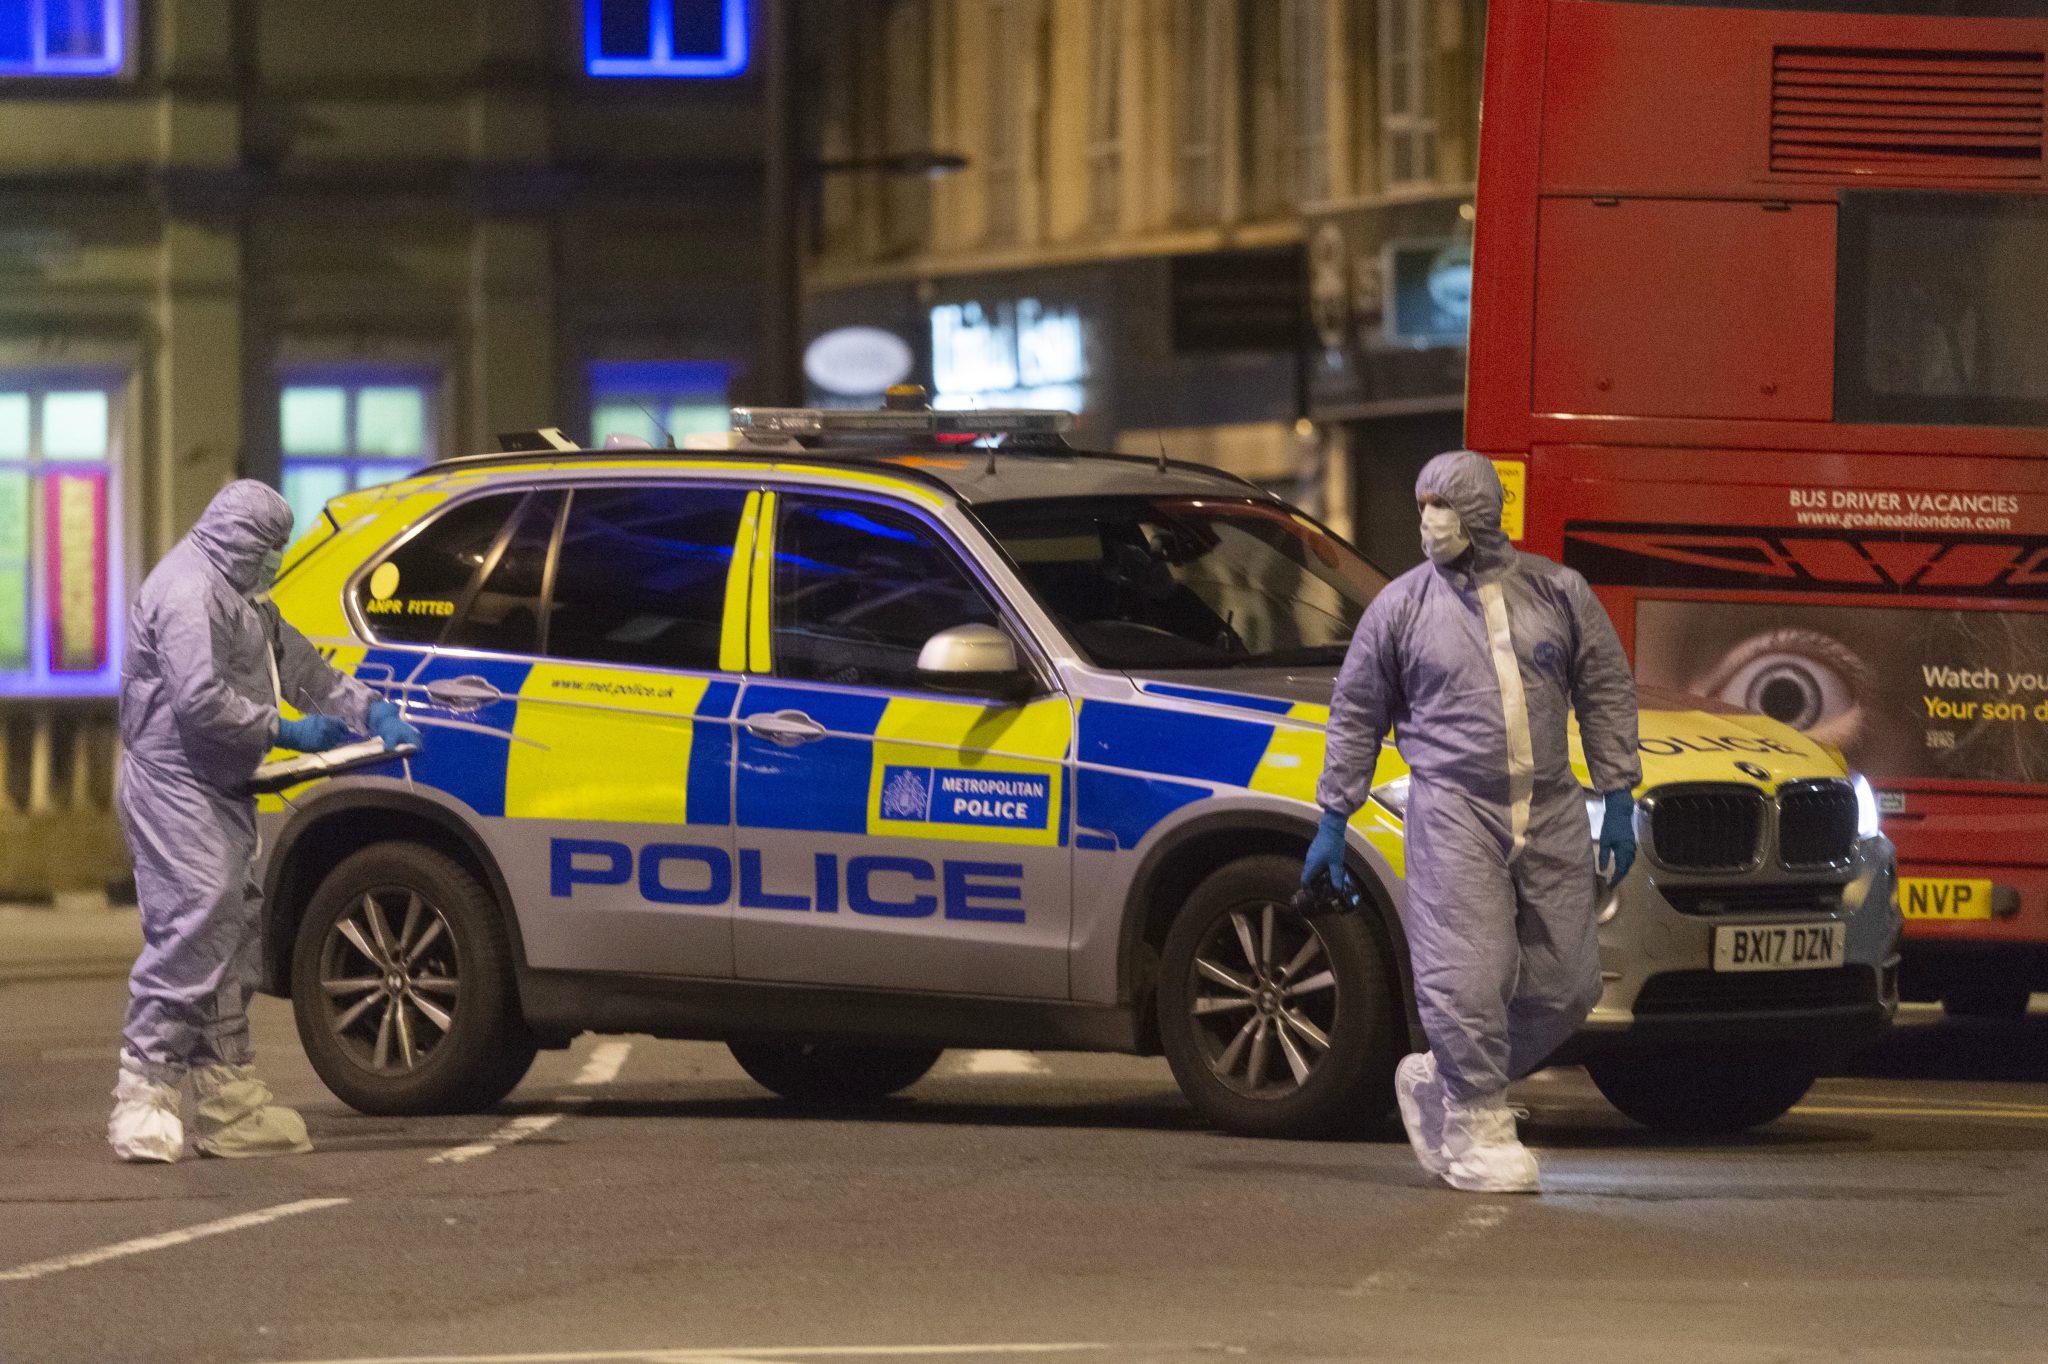 BRITAIN-LONDON-TERRORIST-RELATED INCIDENT